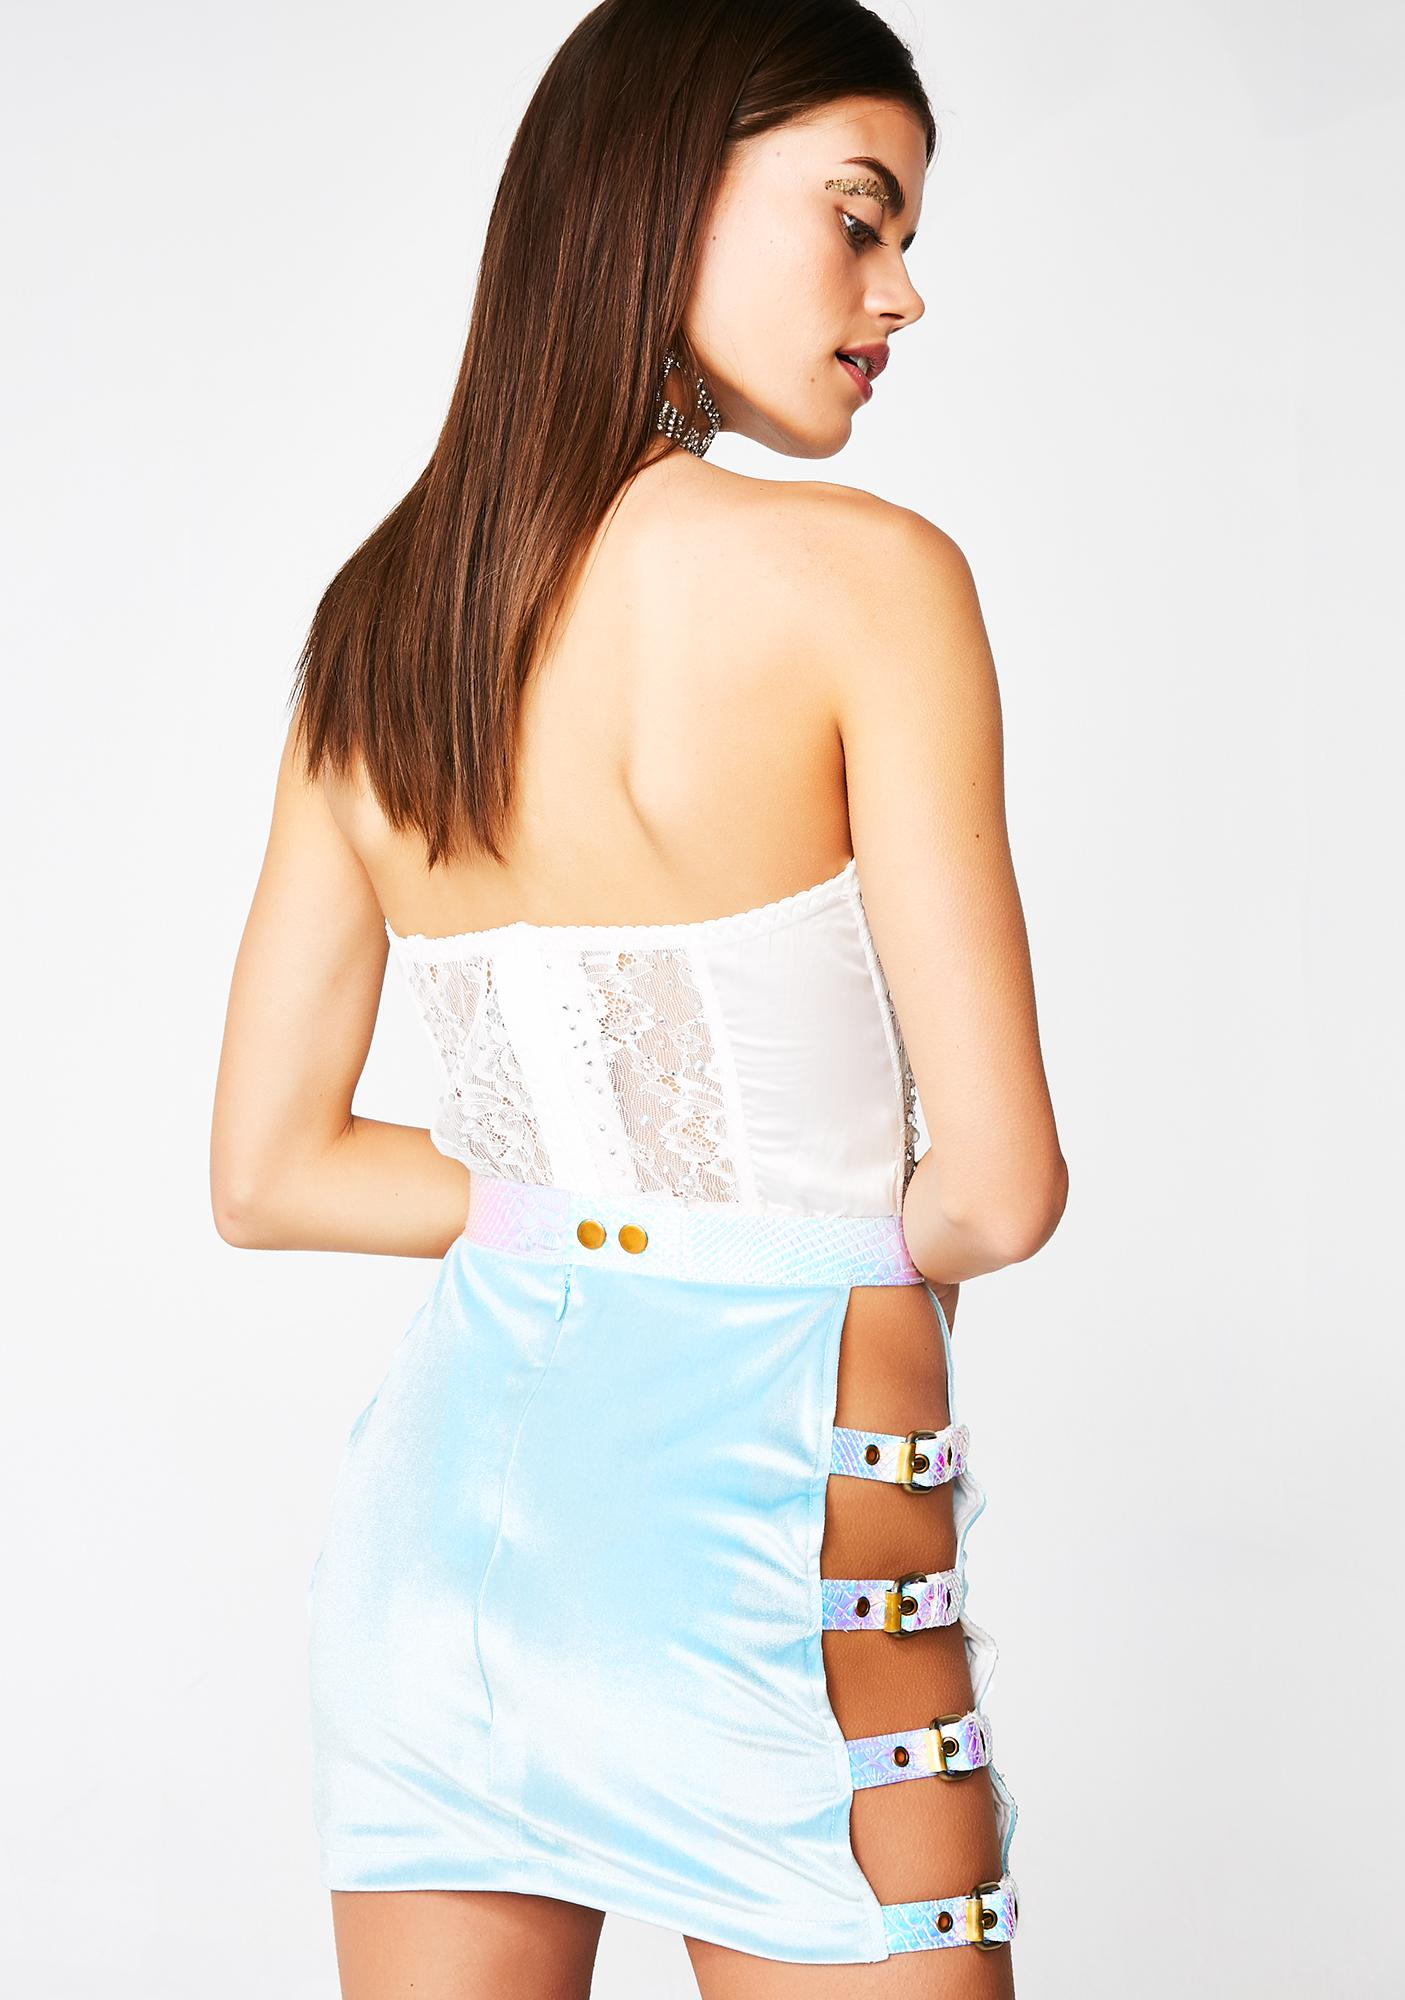 Jackalope Land Daydreamer Harness Skirt